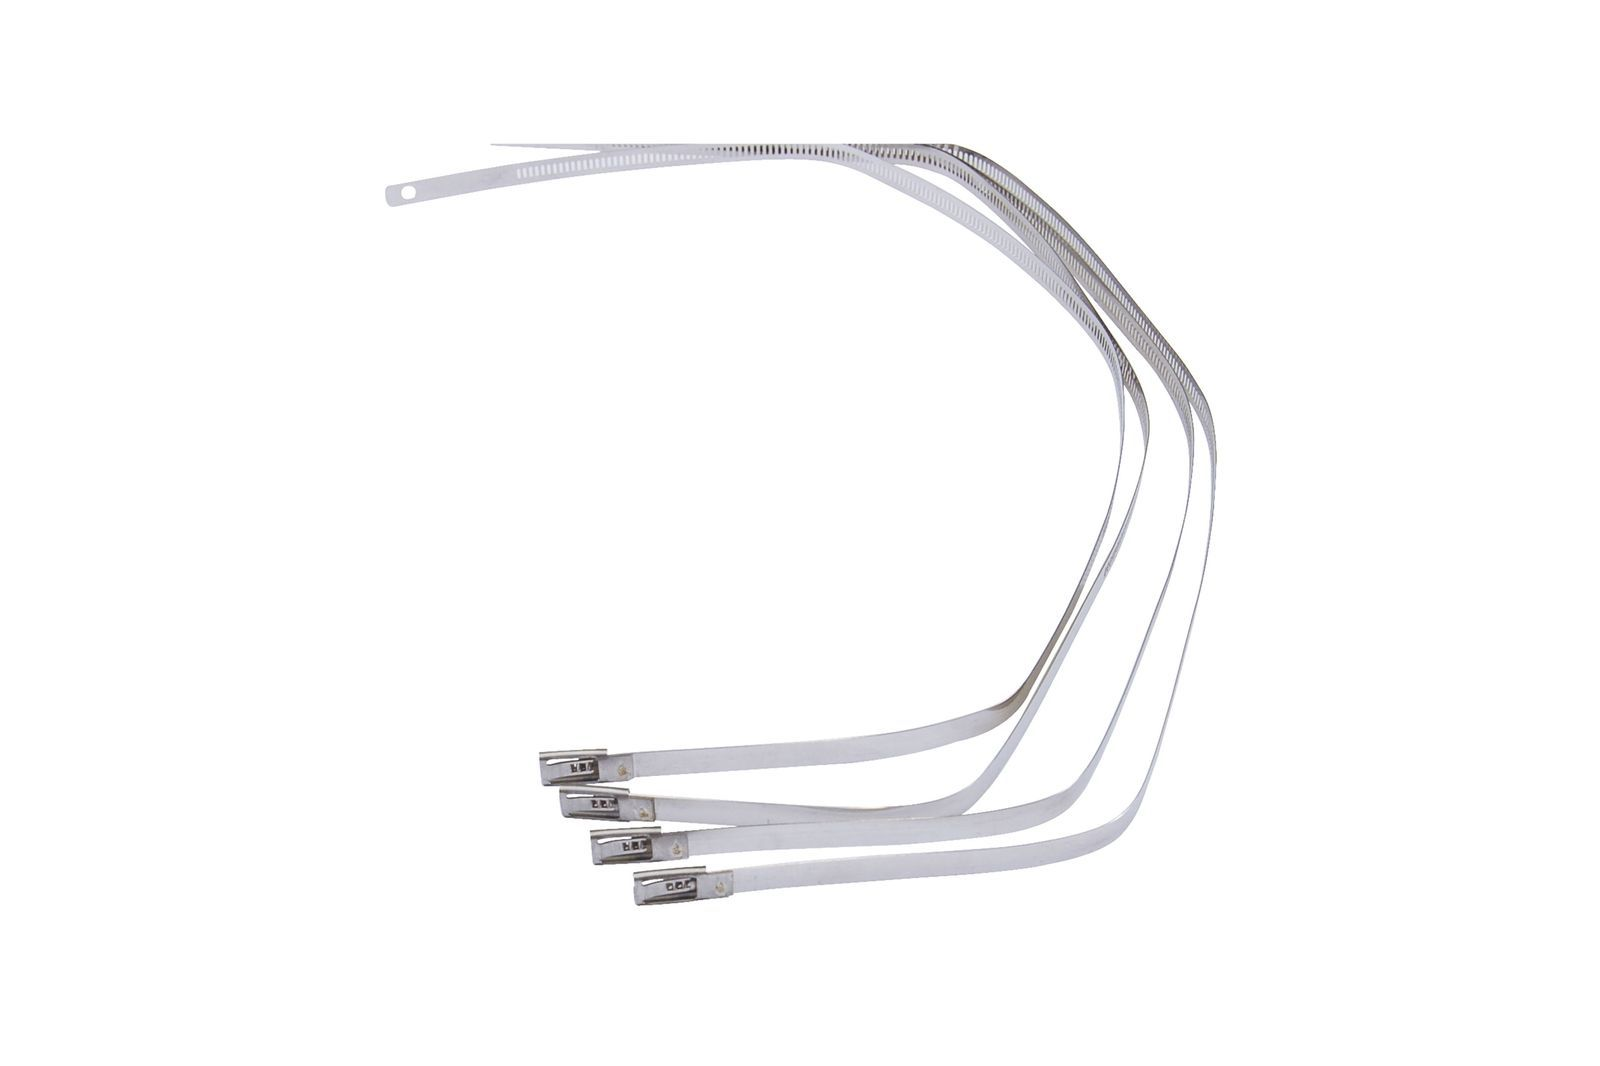 #Edelstahl Kabelbinder-Satz 6x 45,72 cm, GAC0175